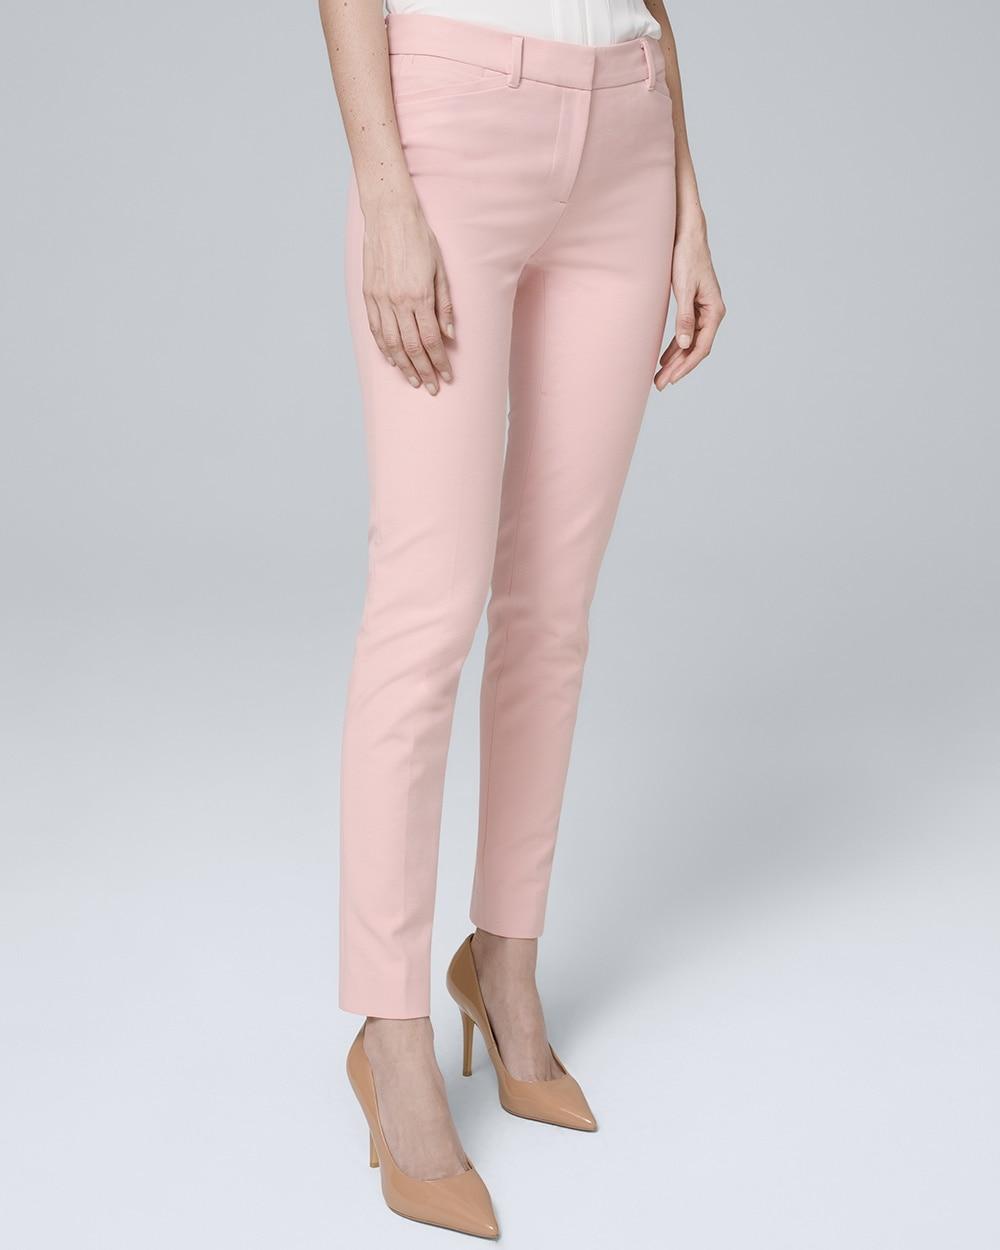 093859b48365 Modern-Fit Comfort Stretch Slim Ankle Pants - White House Black Market